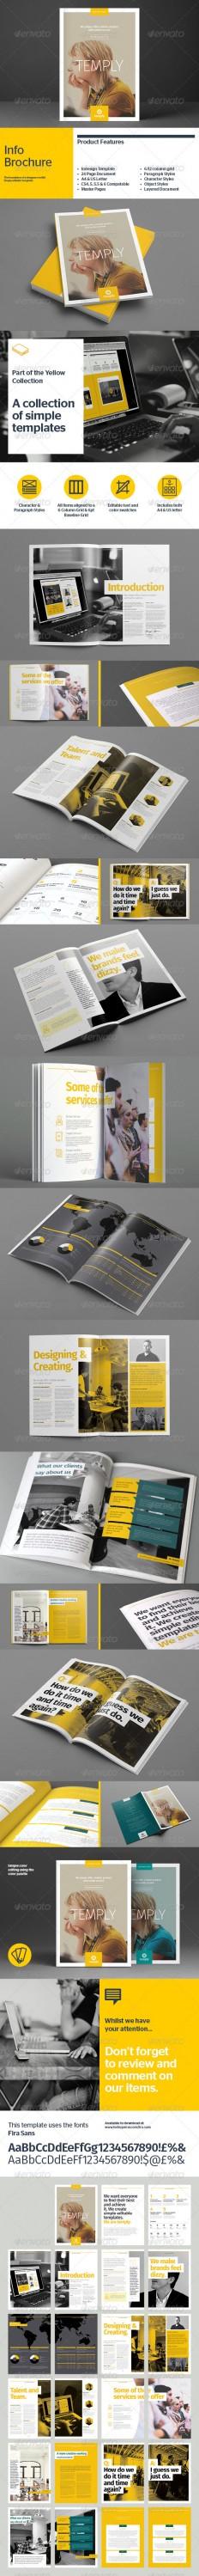 InfoBrochure | GraphicRiver